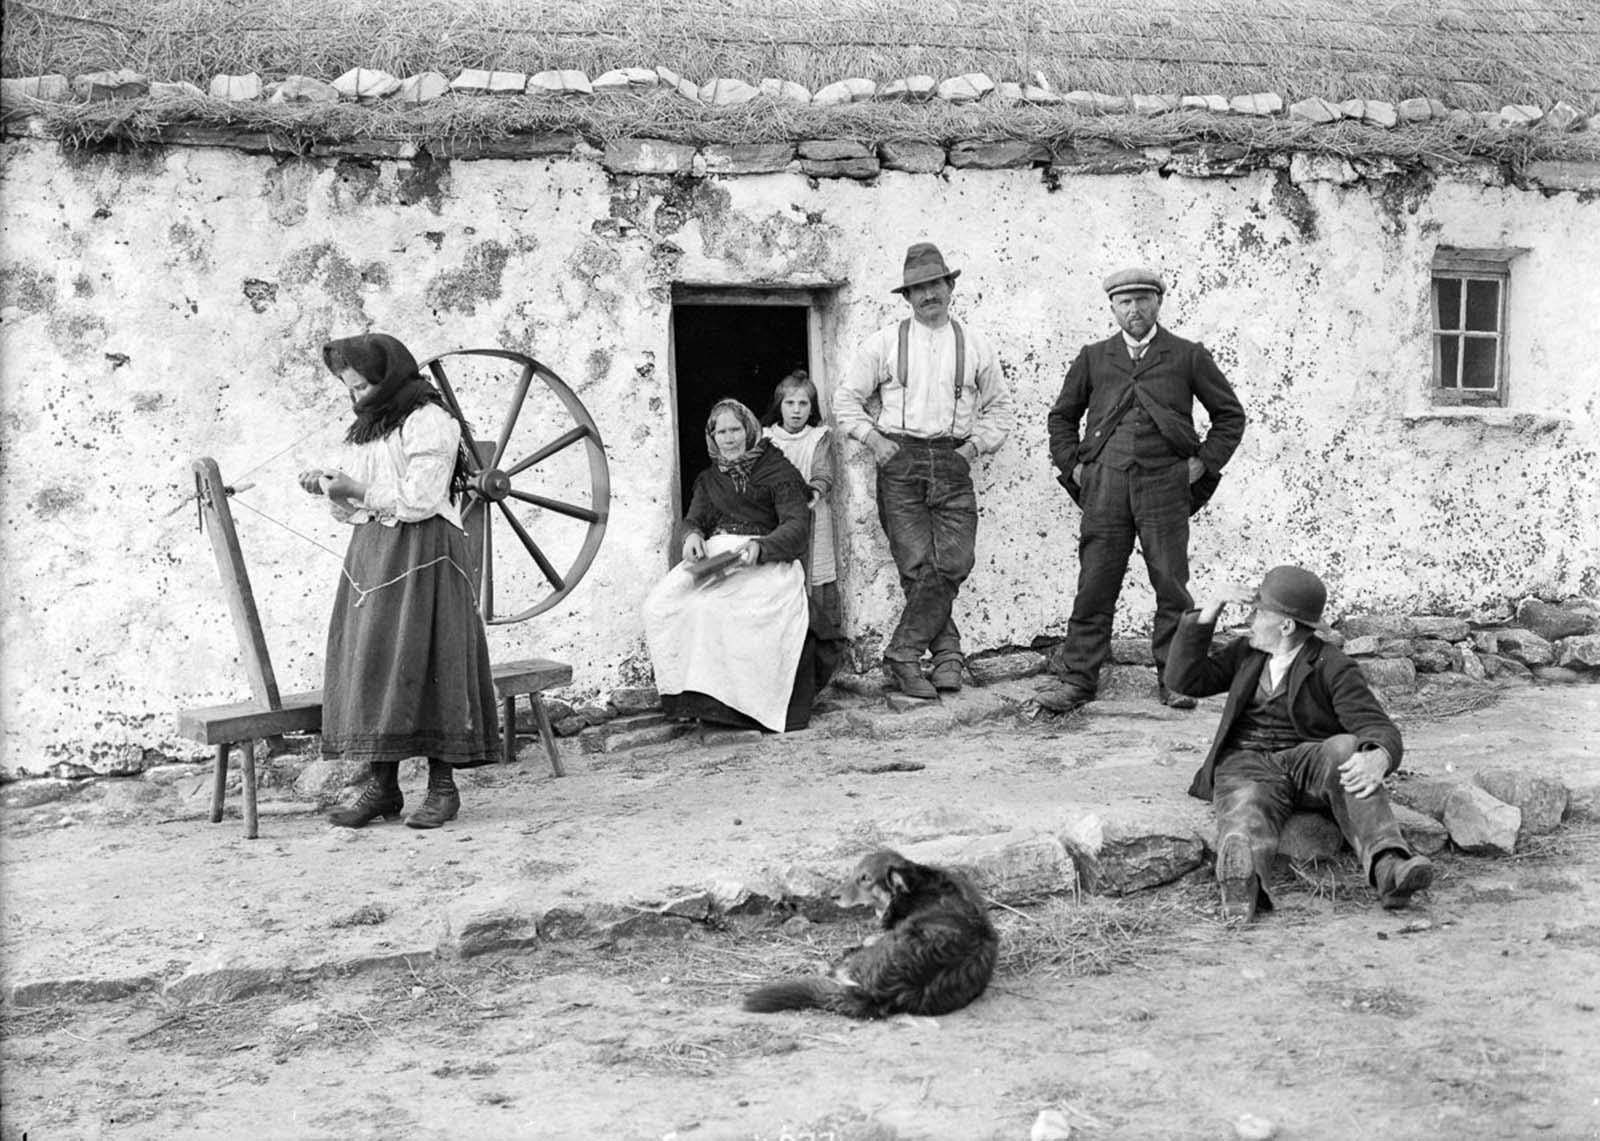 Ireland, 1900.